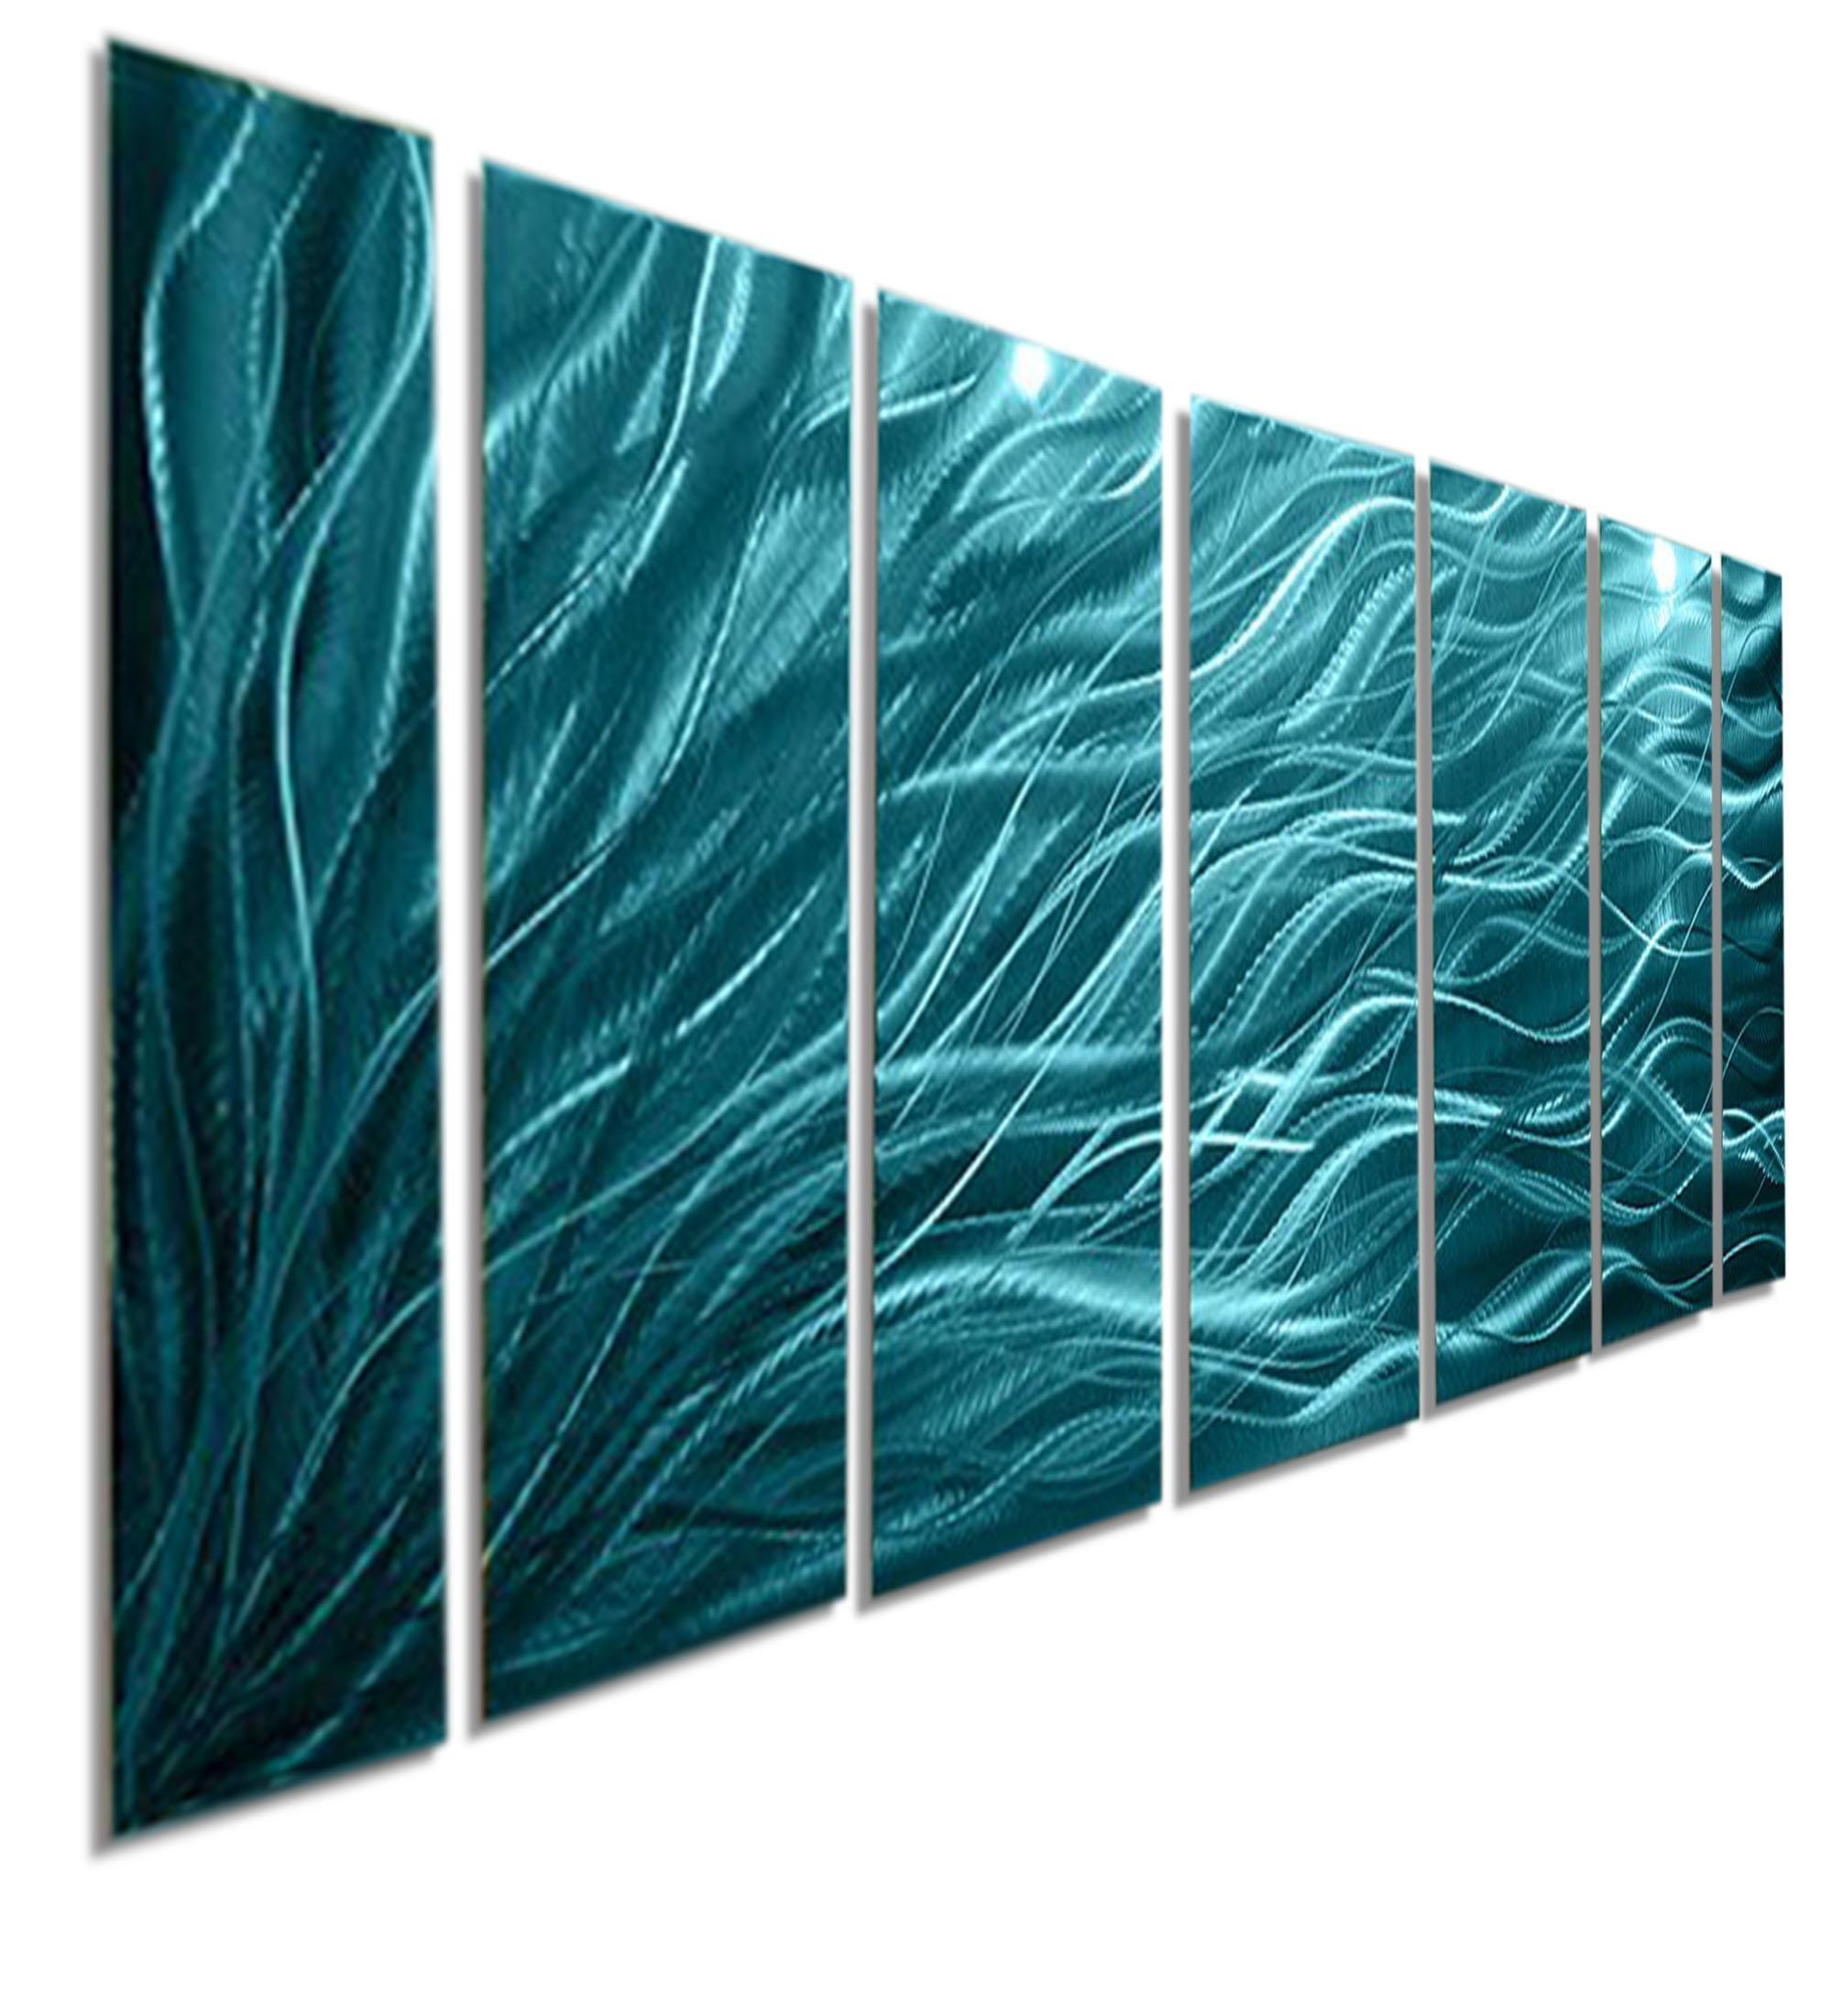 Rays Of Hope Aqua – Large Modern Abstract Metal Wall Artjon Inside Turquoise Metal Wall Art (Image 11 of 20)